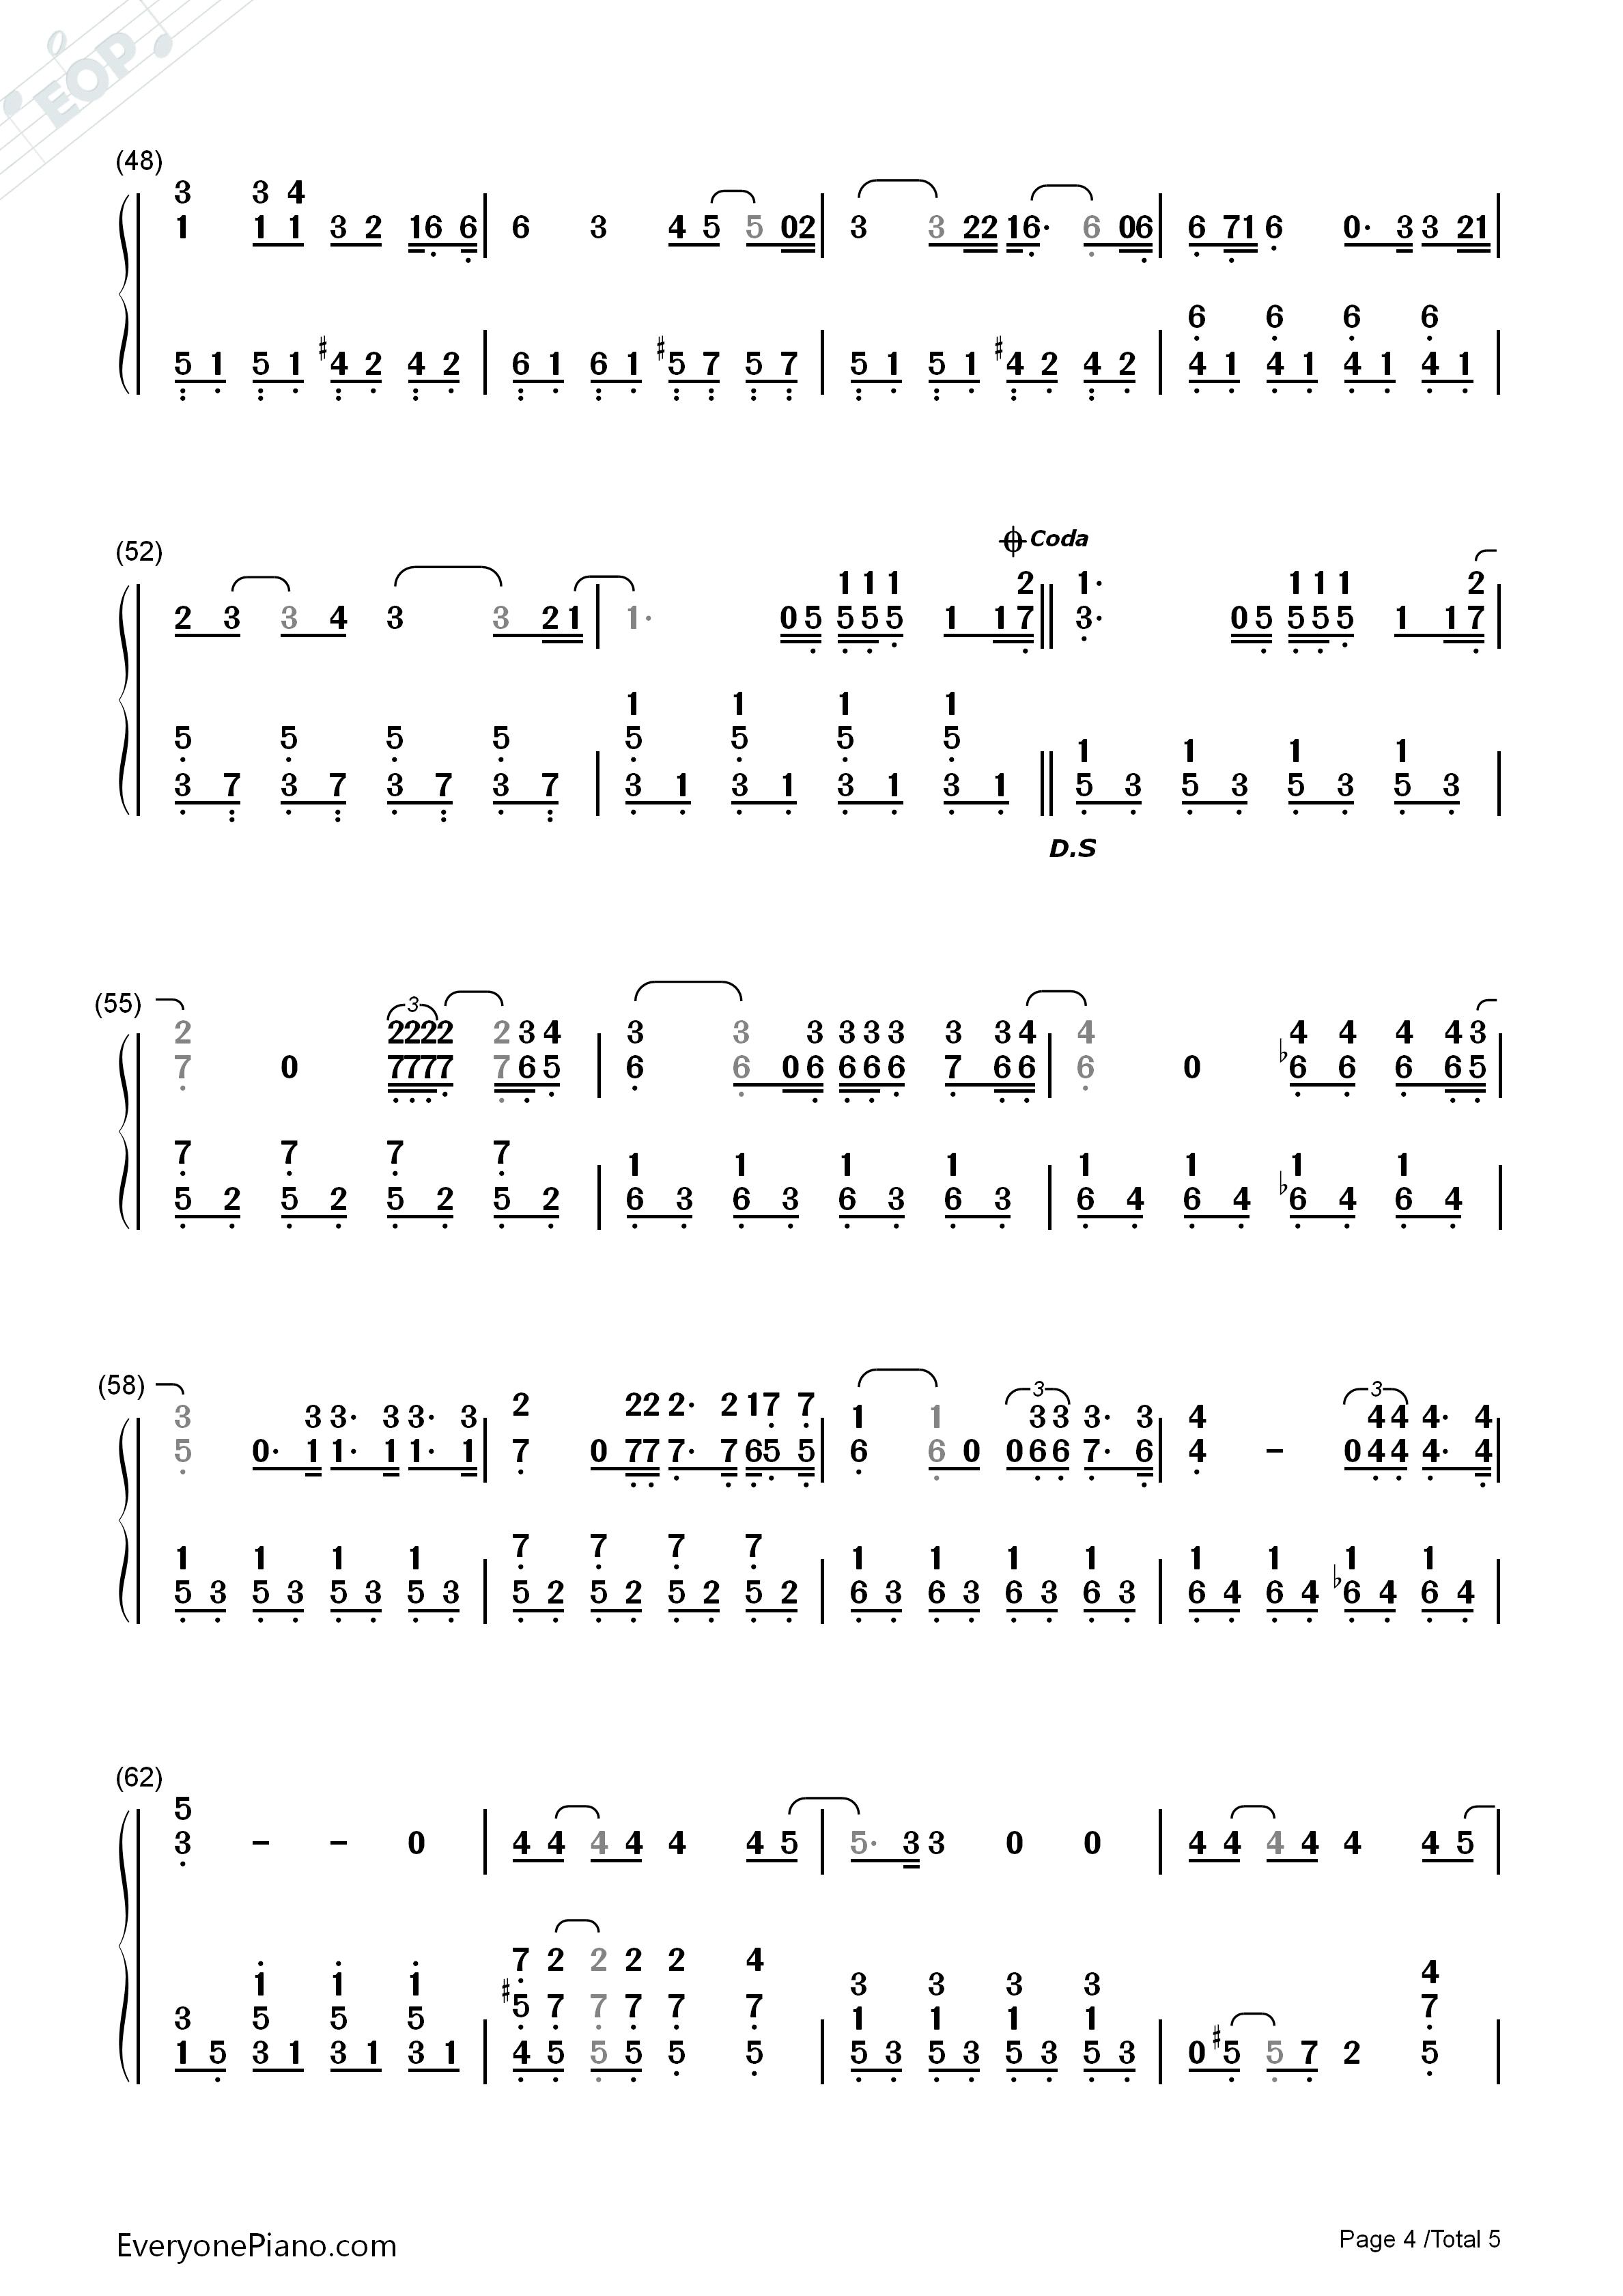 Perri双手简谱预览4 钢琴谱档 五线谱 双手简谱 数位谱 Midi PDF 免费